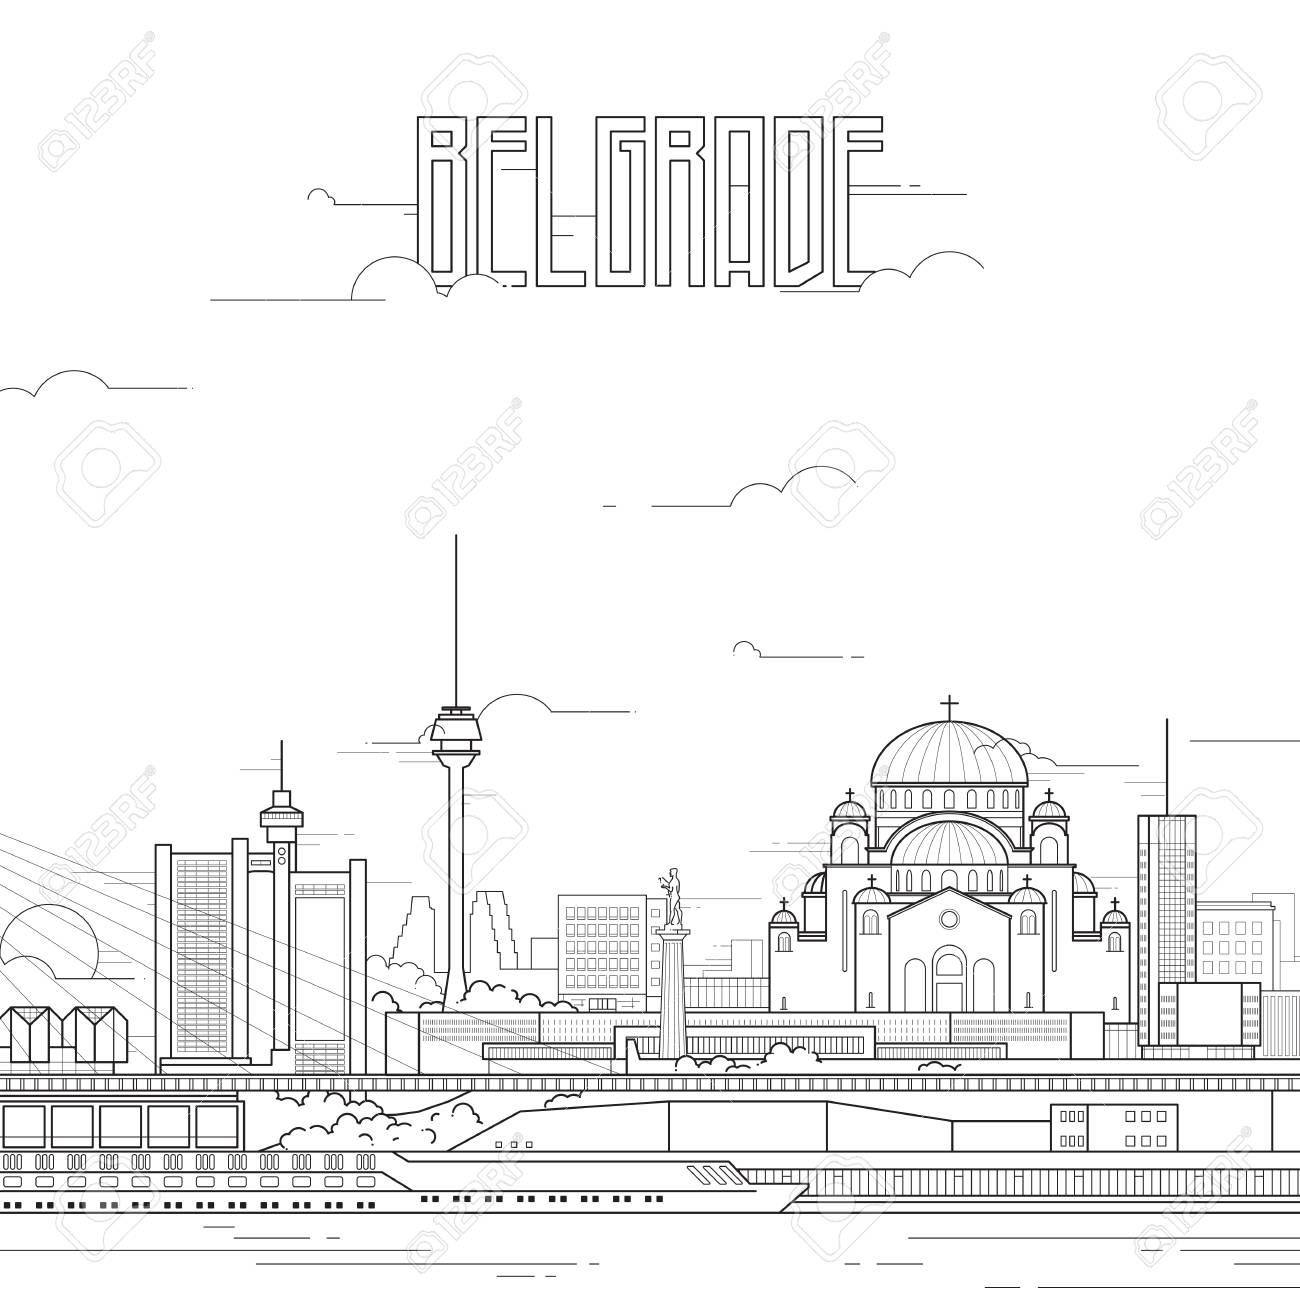 Belgrade city with iconic buildings - 71749352